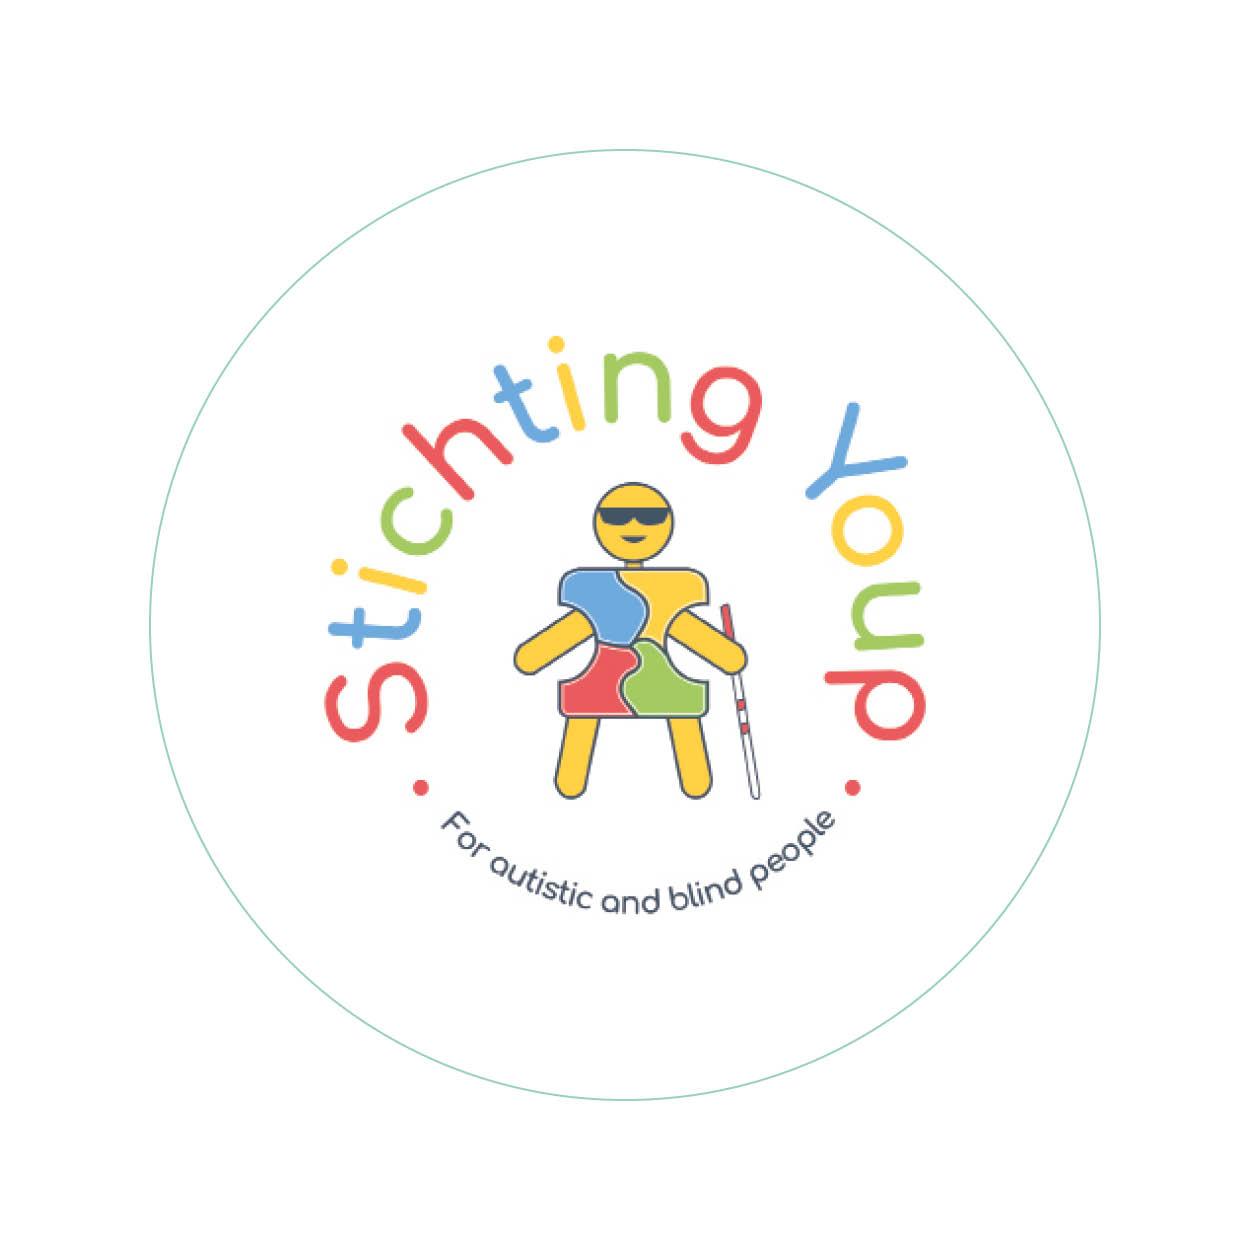 Logo ontwerp - St. Youp - Dots & Lines - Grafisch ontwerp